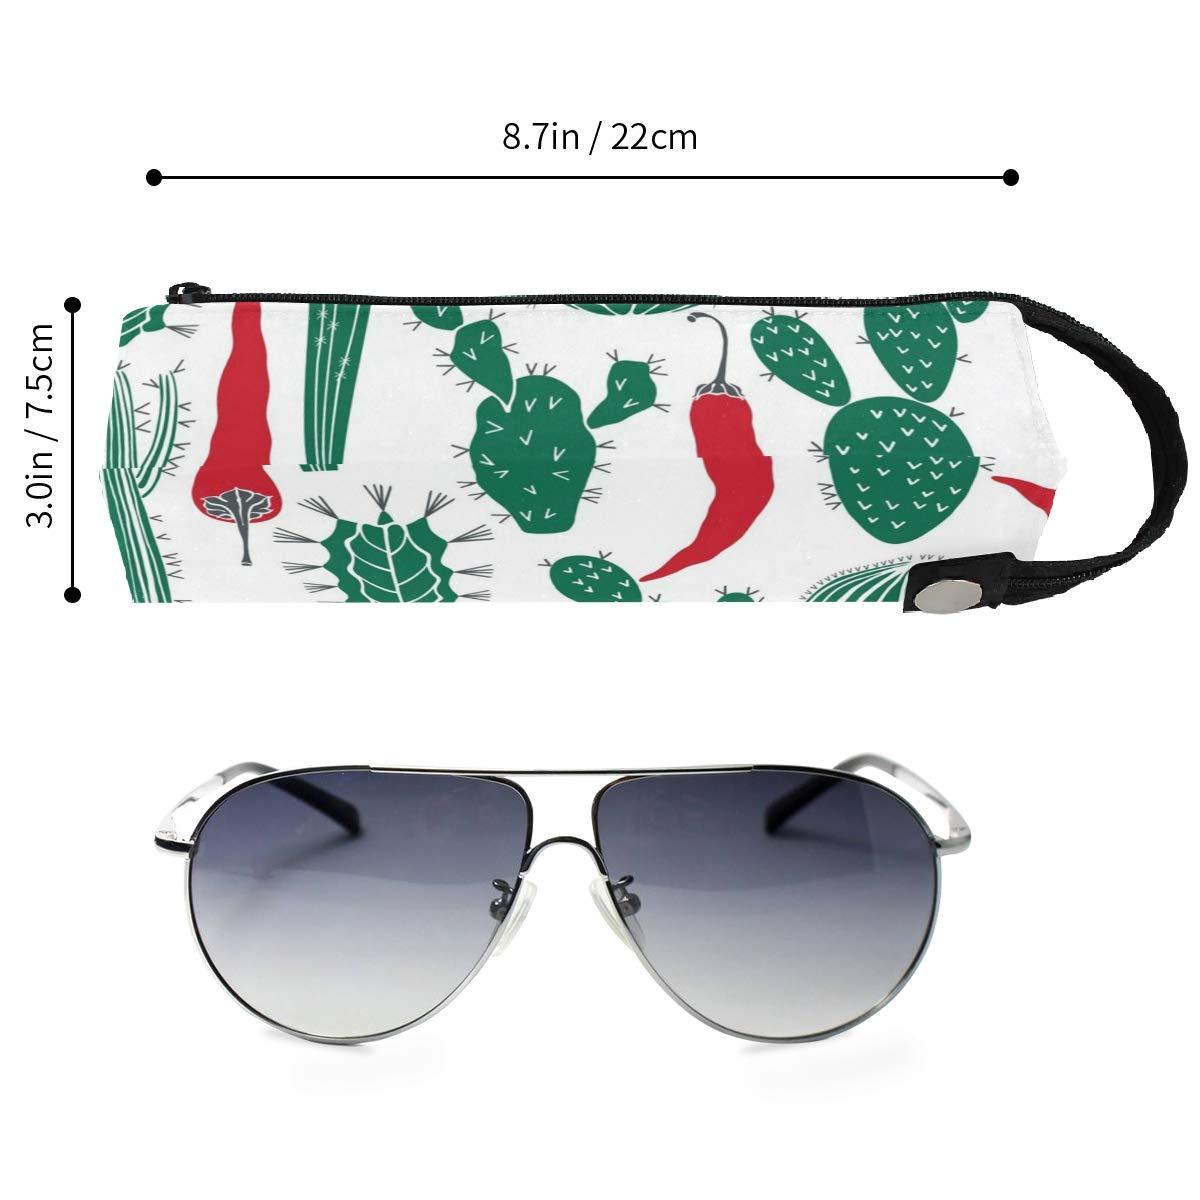 My Little Nest Eyeglass Sunglasses Holder Pouch Bag Cactus Pepper Multi Function Zipper Pen Case Pencil Bag Organizer